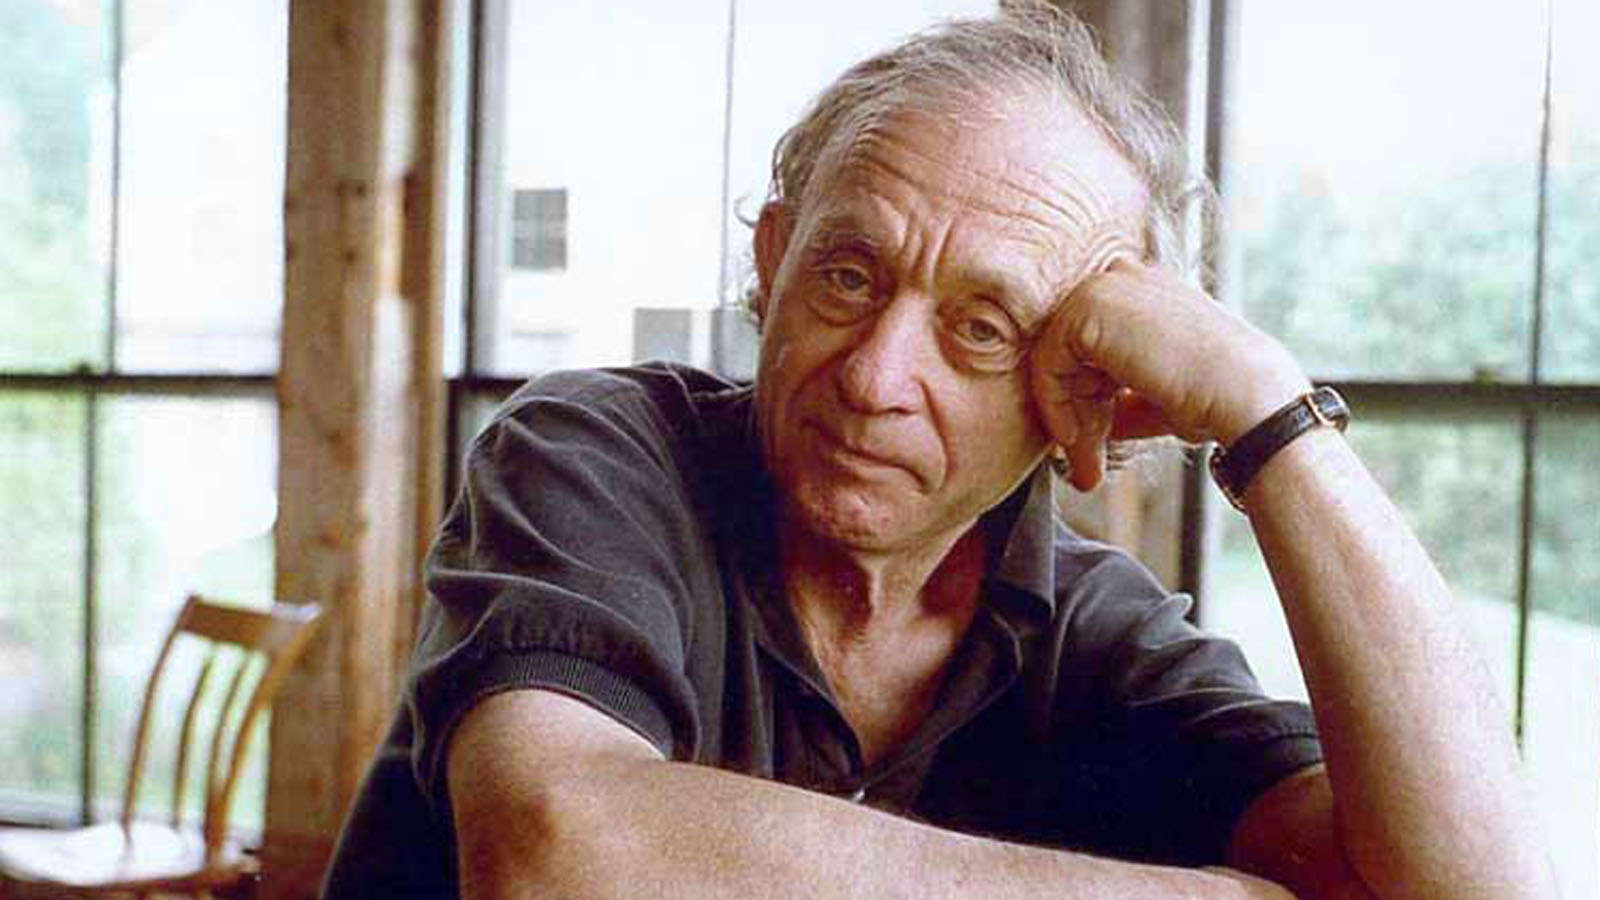 Frederick Wiseman. Photo by John Ewing, courtesy of Zipporah Films